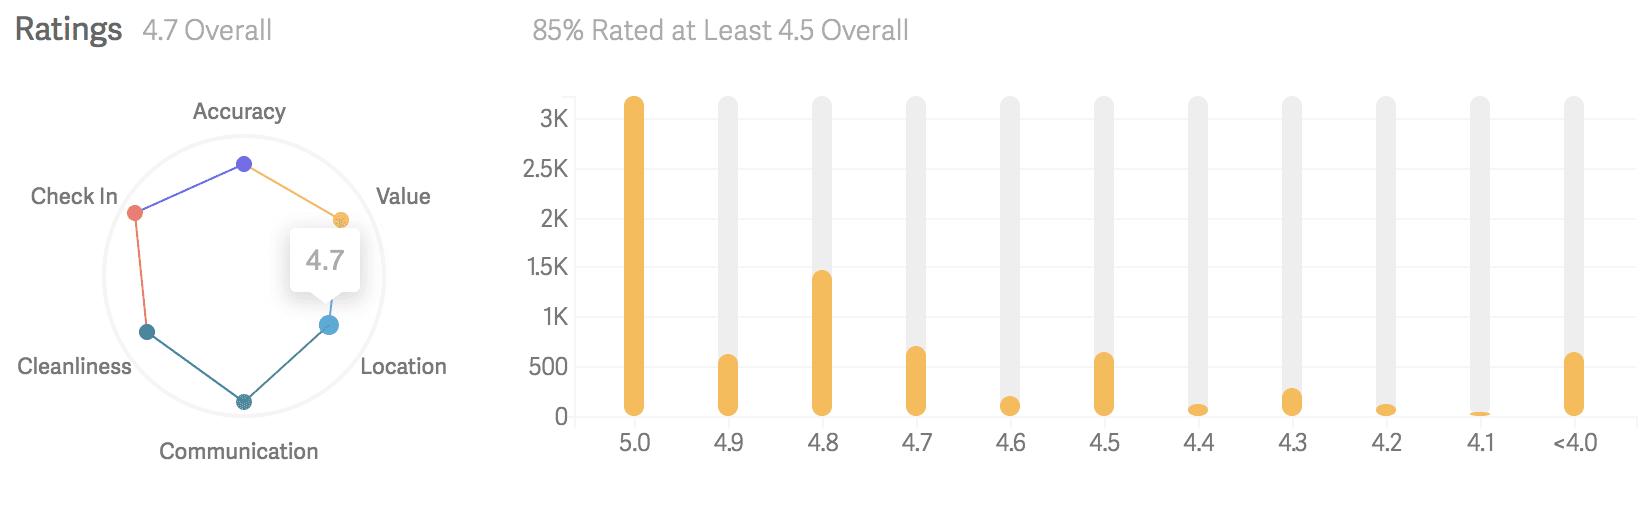 AirDNA MarketMinder - Ratings